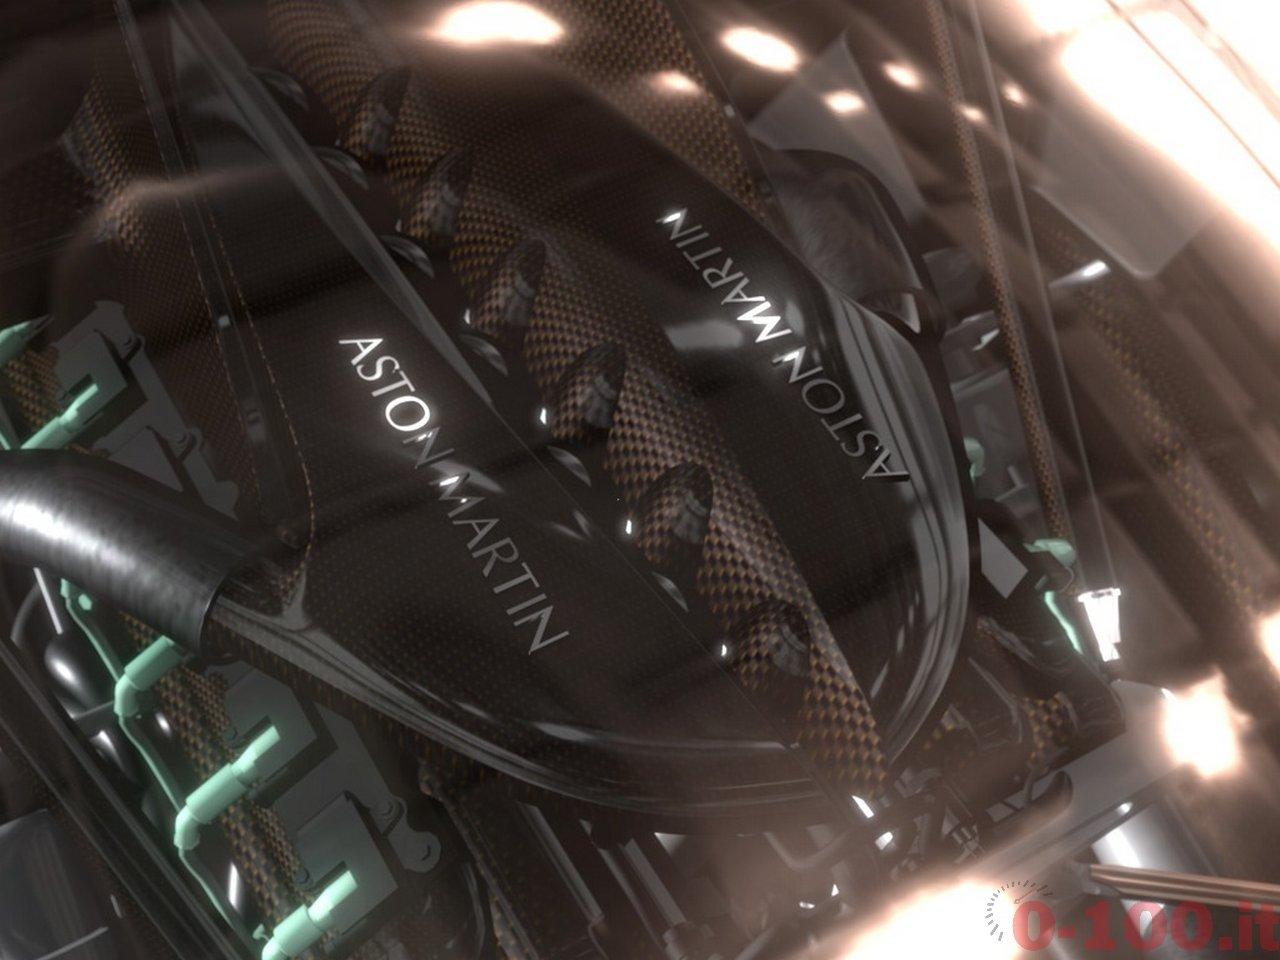 aston-martin-design-prototype-100-vision-gran-turismo-6-sony-playstation-0-100_3